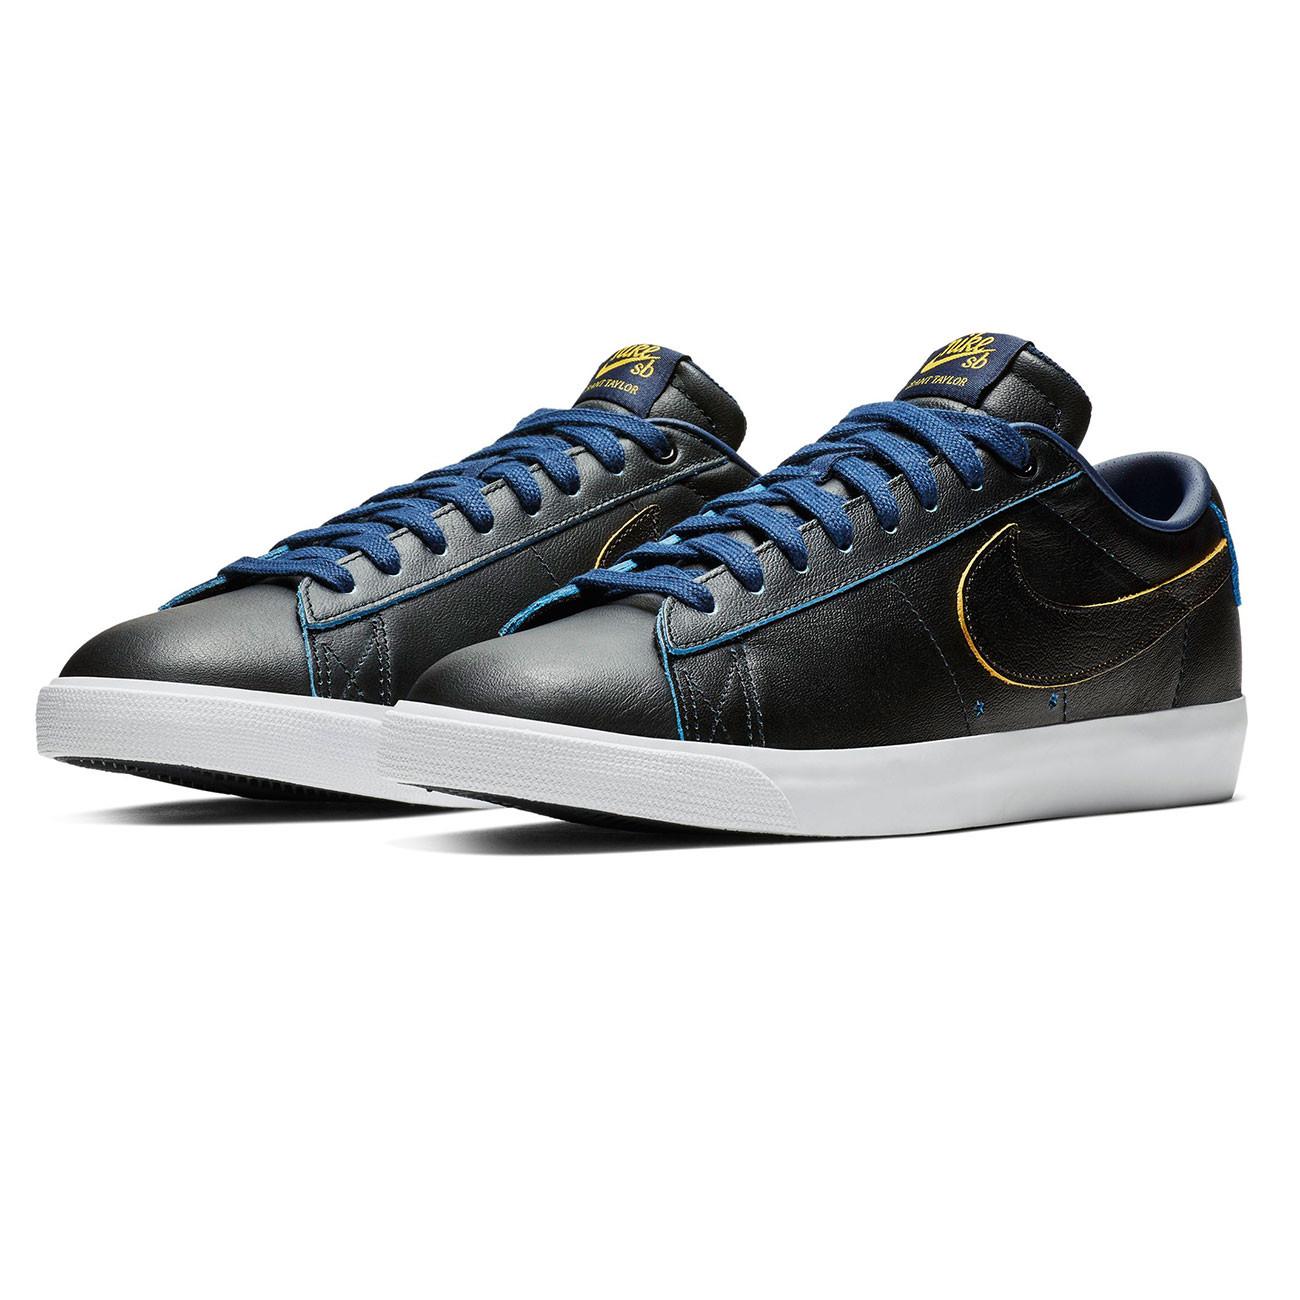 finest selection 43d78 59d3f Sneakers Nike SB Blazer Low Grant Taylor Nba